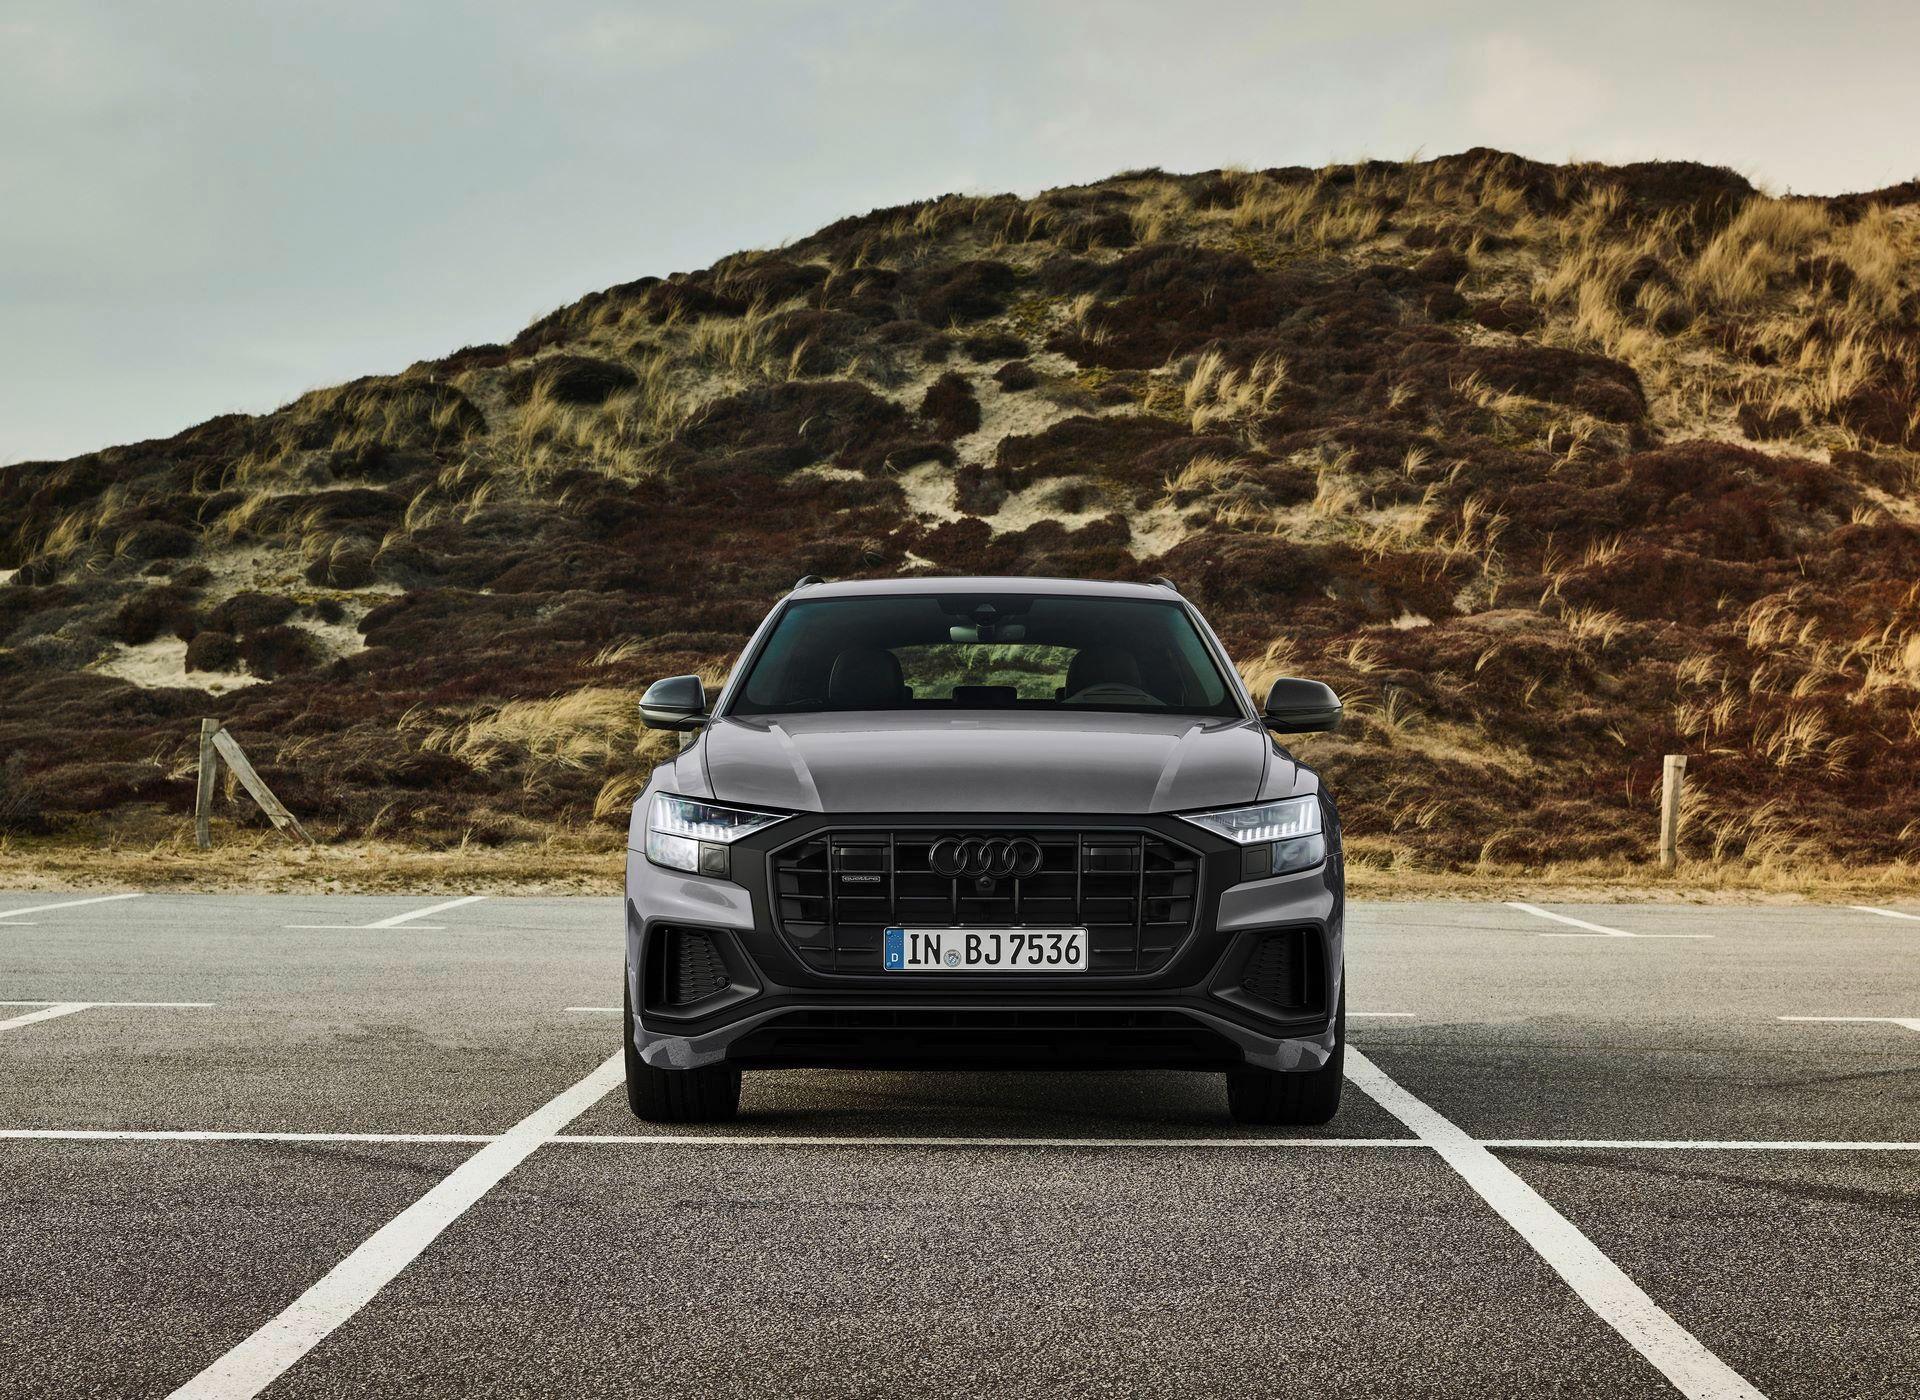 Audi-A4-A5-Q7-Q8-Competition-And-Competition-Plus-Trims-14